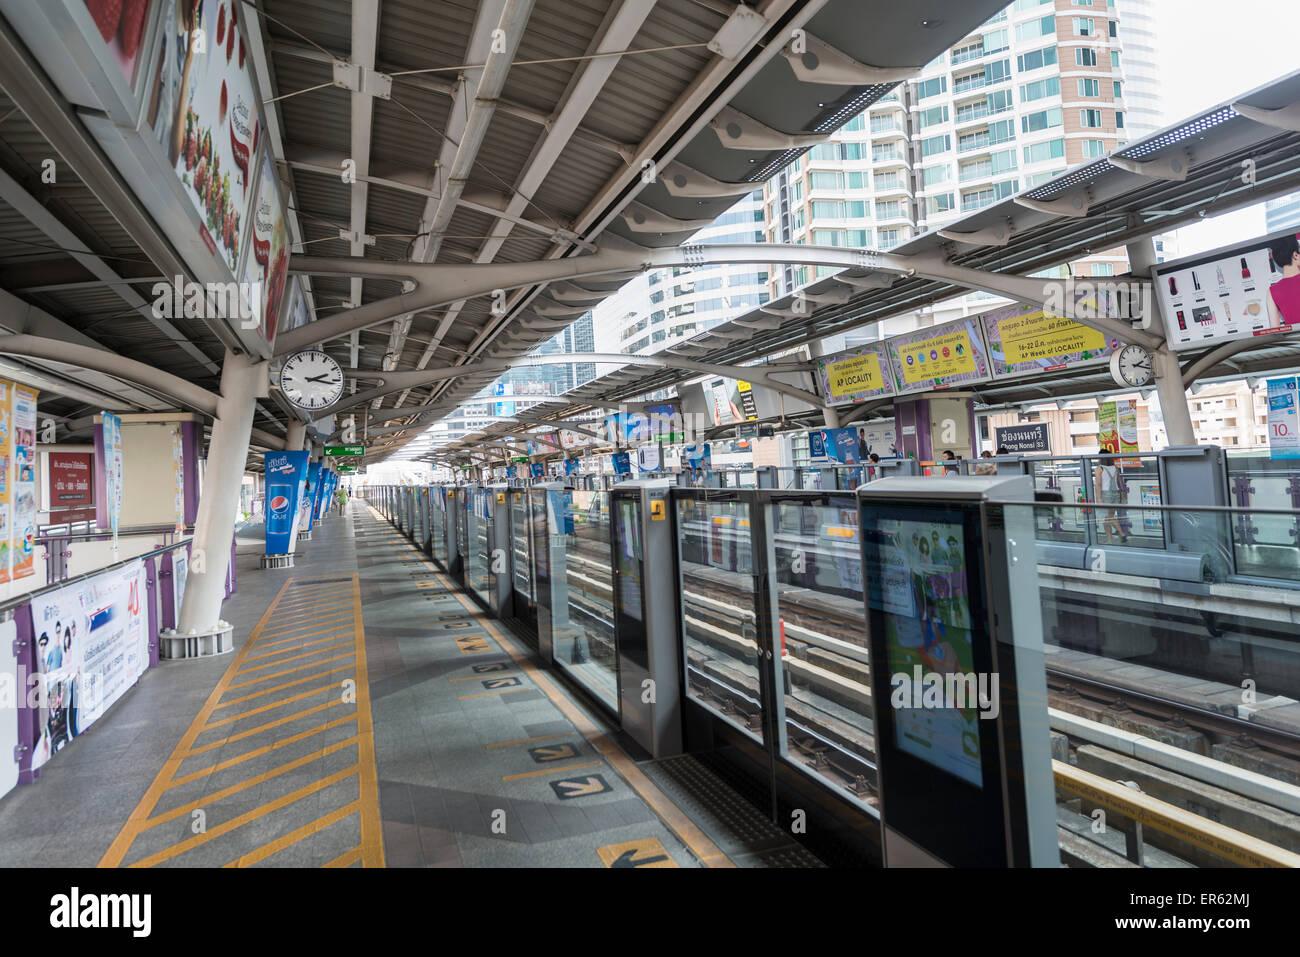 BTS Skytrain station, Bangkok Mass Transit System, platform, Bangkok, Thailand - Stock Image